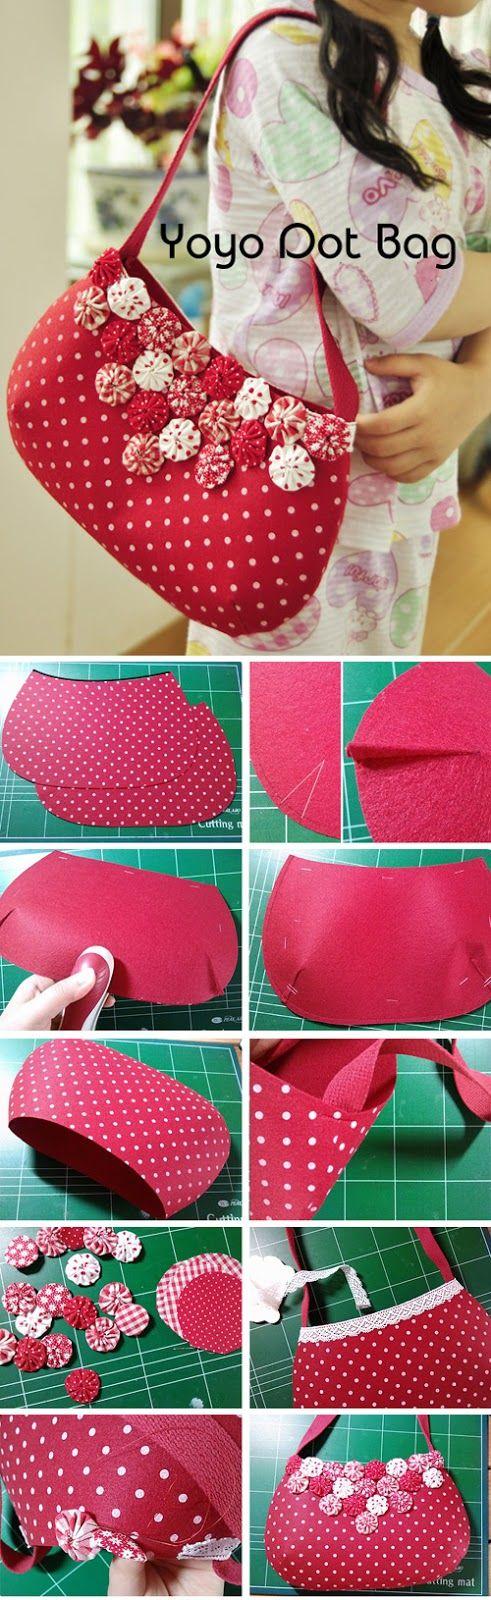 Shoulder Bag with Fabric Yo-Yo Flowers. DIY Pattern & Tutorial in Pictures. http://www.handmadiya.com/2015/11/shoulder-bag-with-yo-yo.html